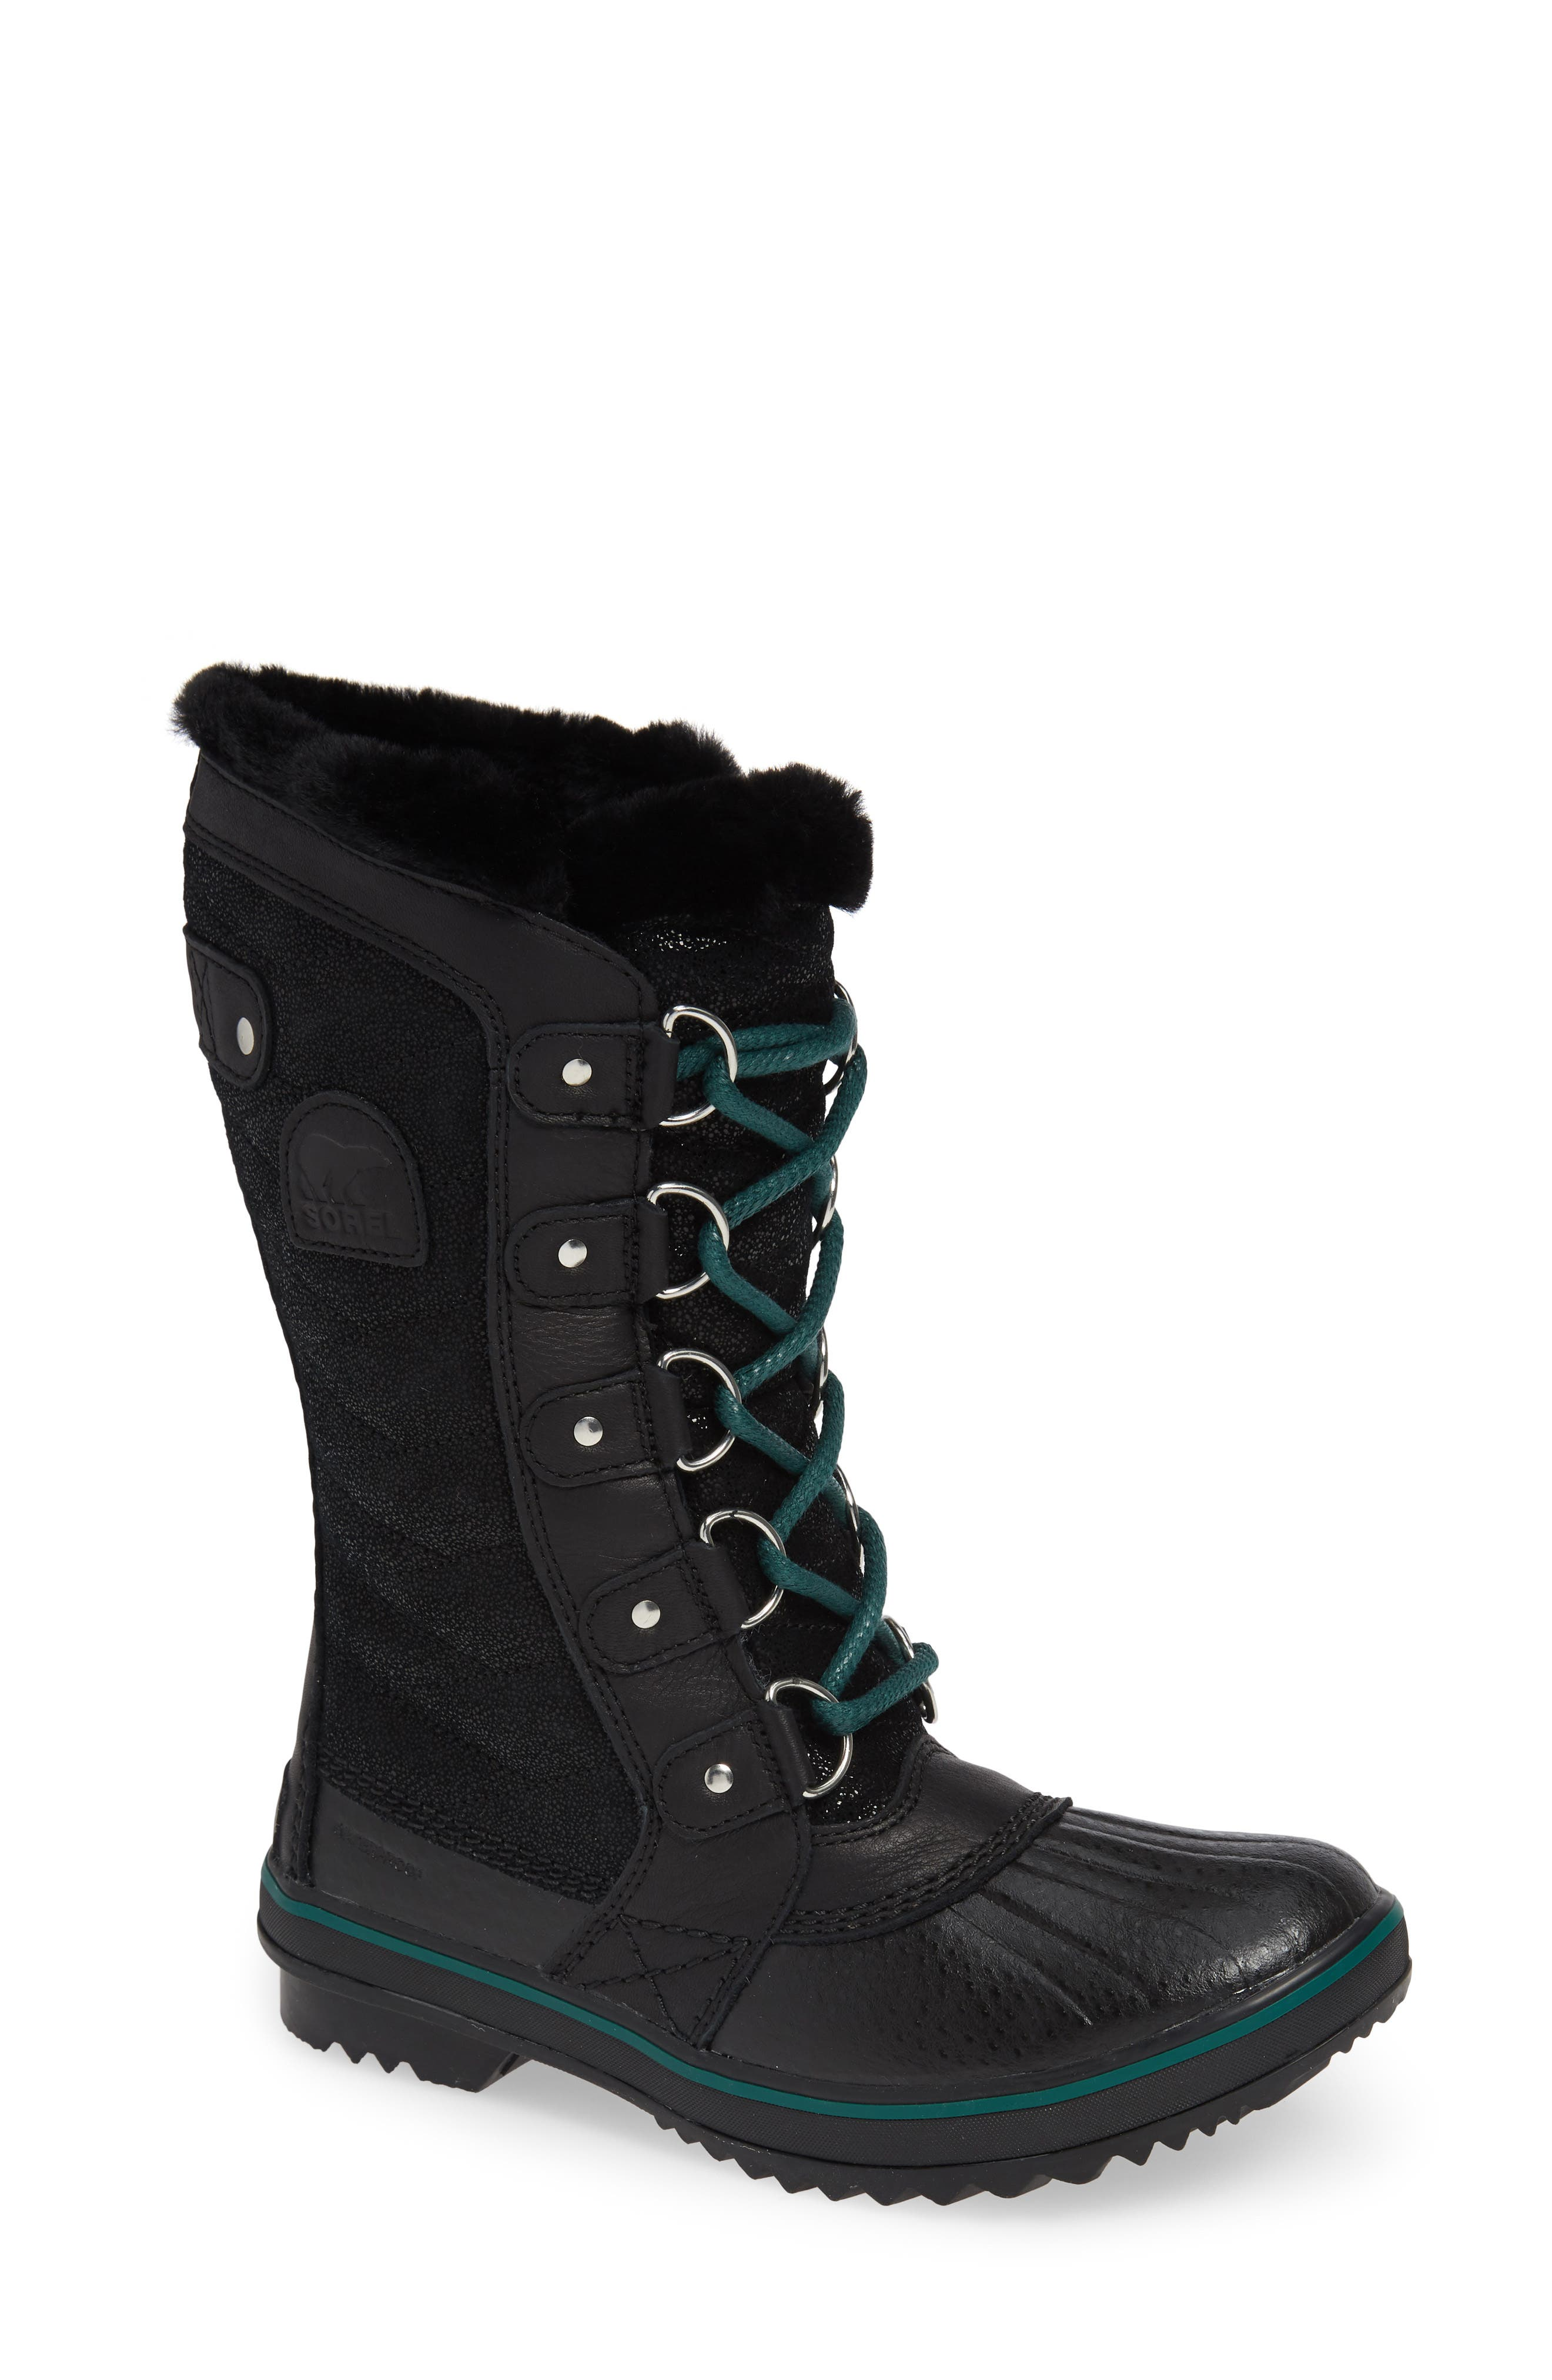 Sorel Tofino Faux Fur & Genuine Shearling Lined Waterproof Boot- Black